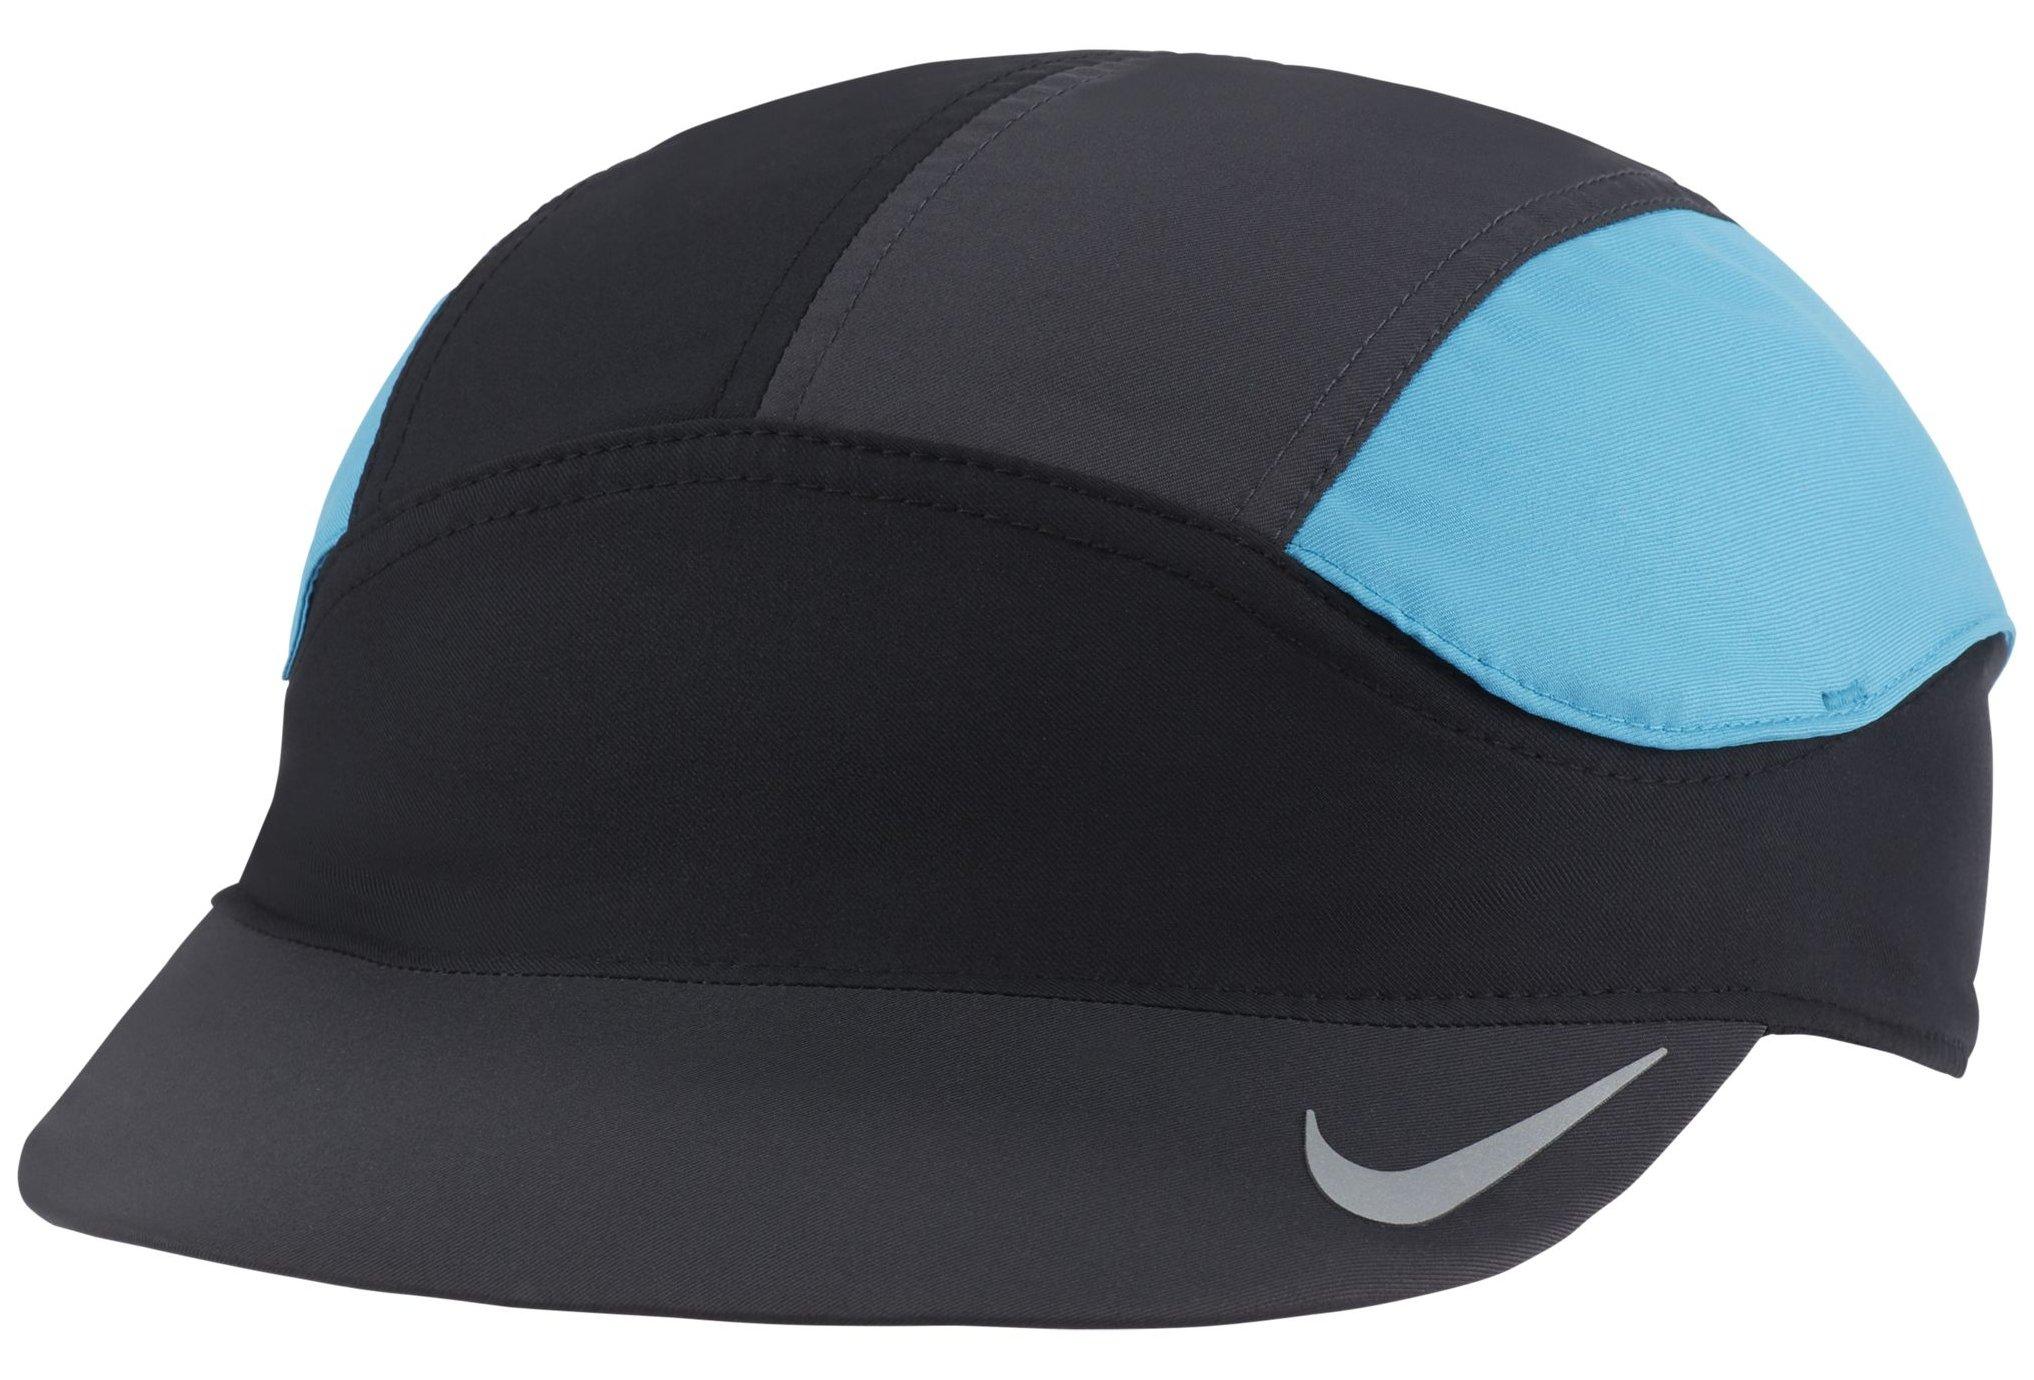 Nike Dri-Fit Tailwind Fast Casquettes / bandeaux